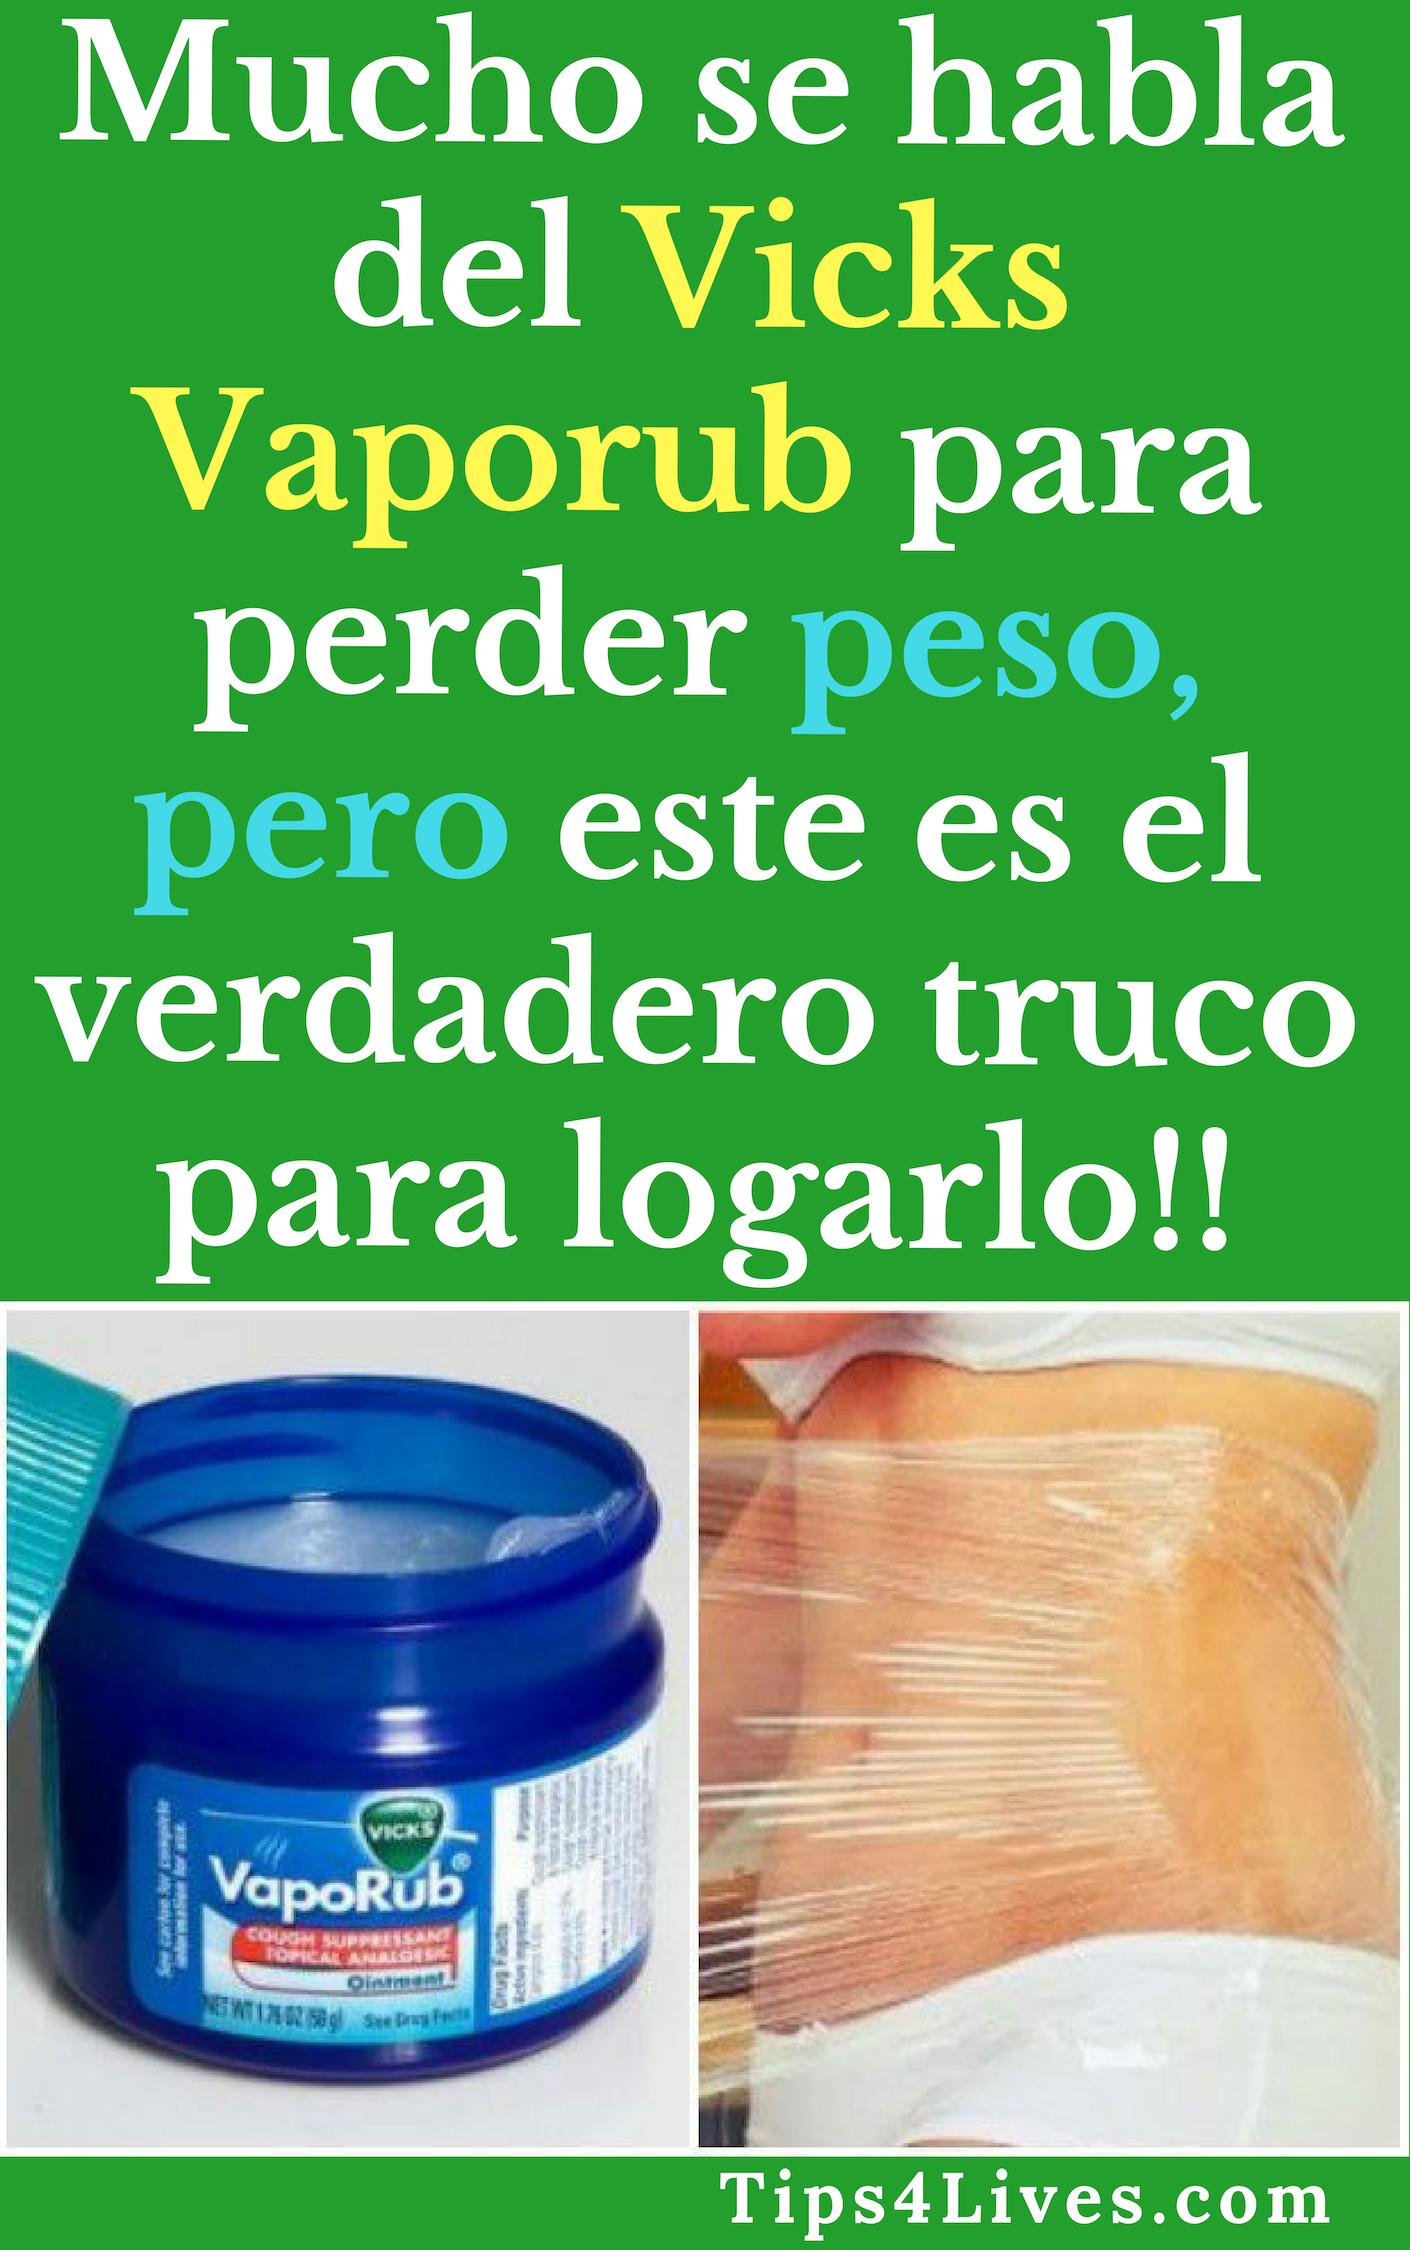 vick vaporub ayuda a bajar de peso